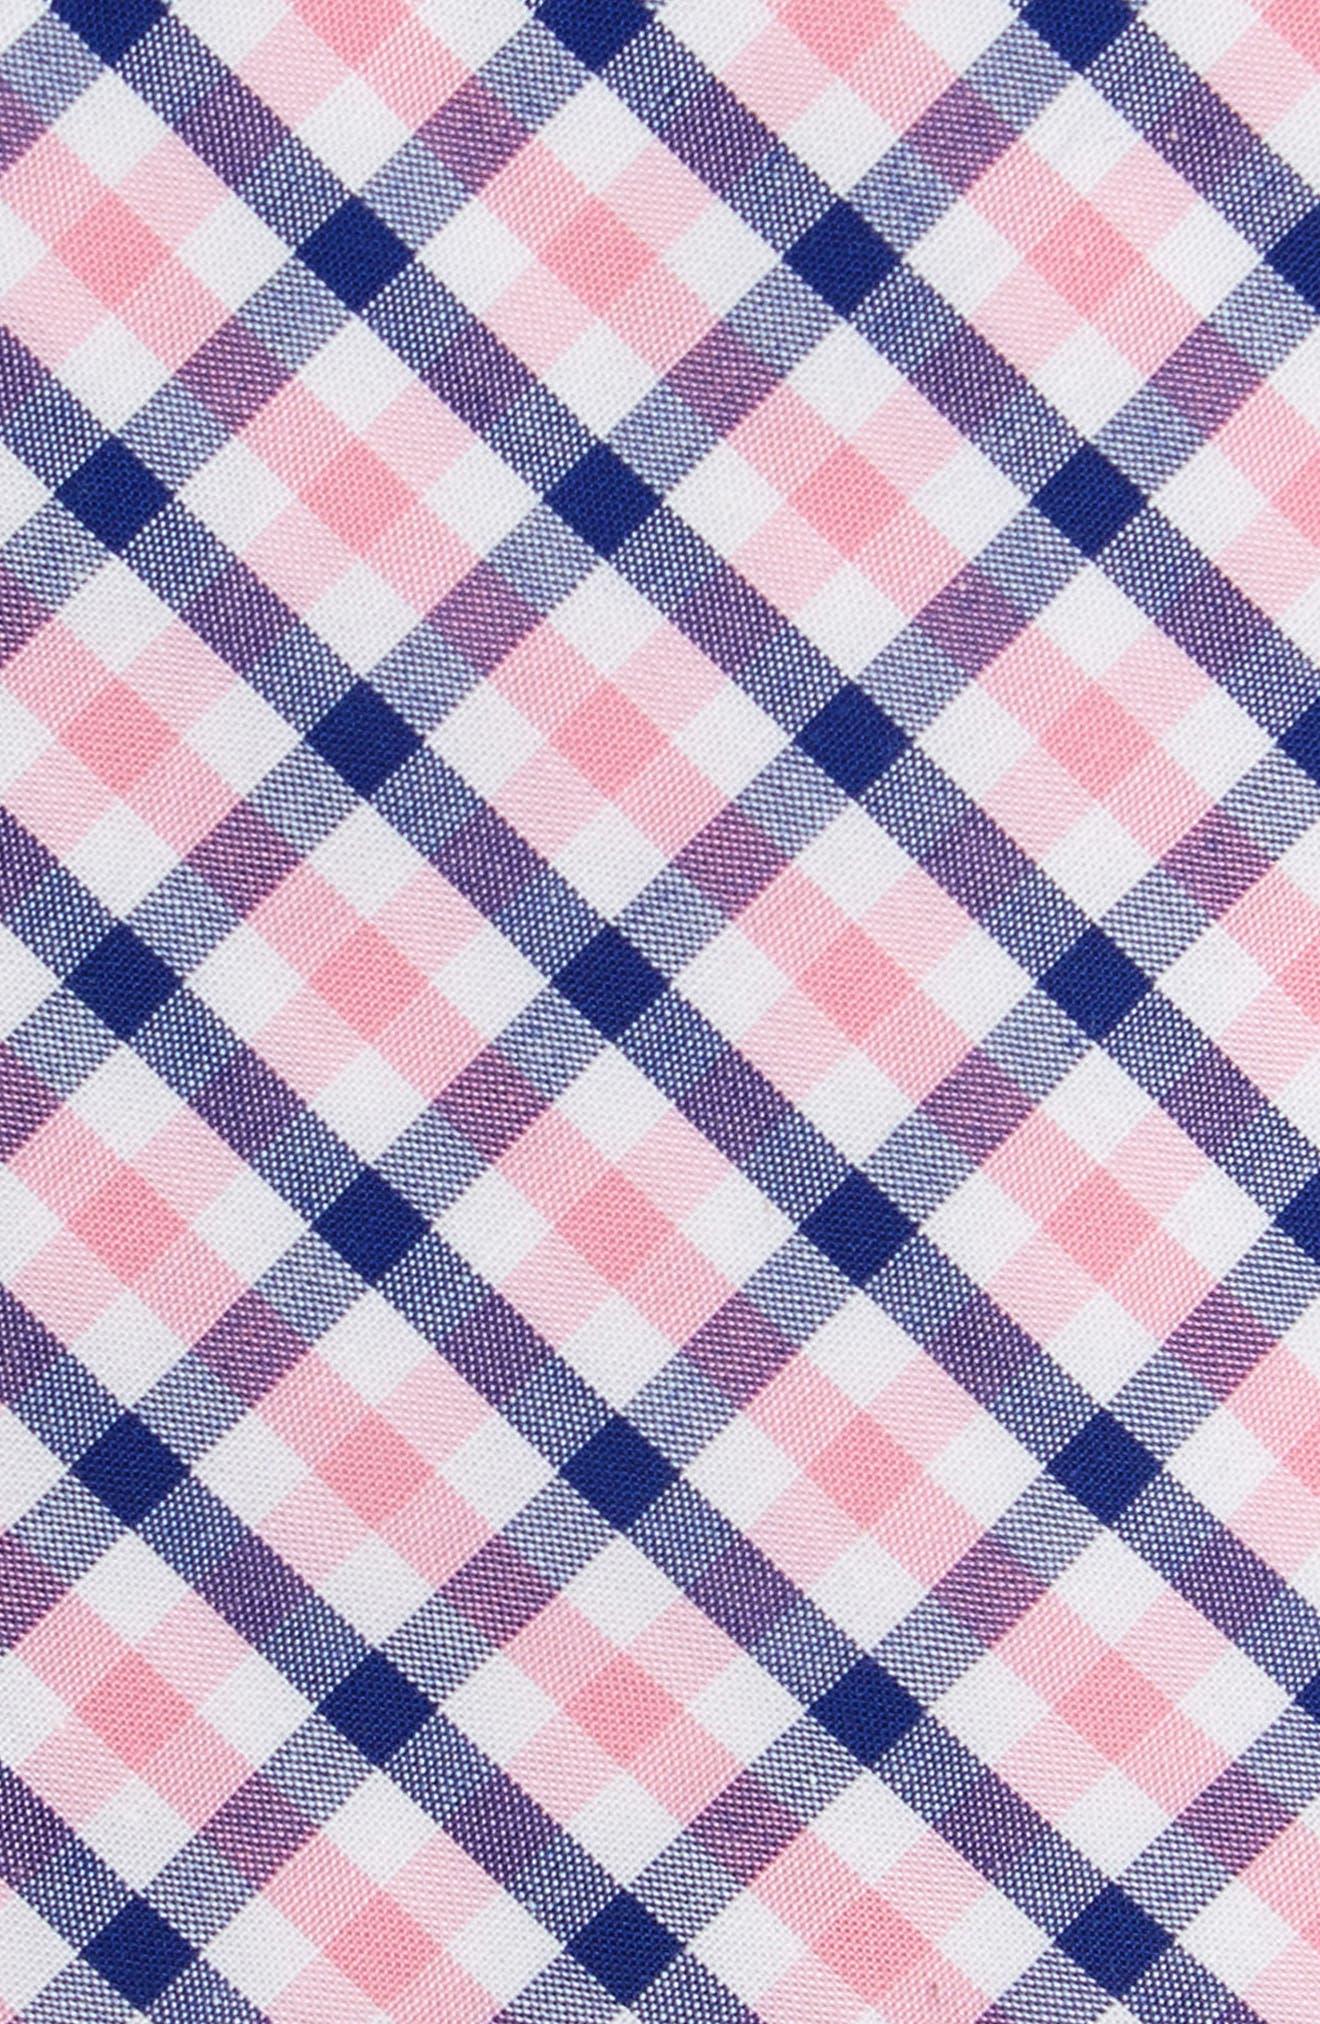 Robin Diamond Check Skinny Tie,                             Alternate thumbnail 9, color,